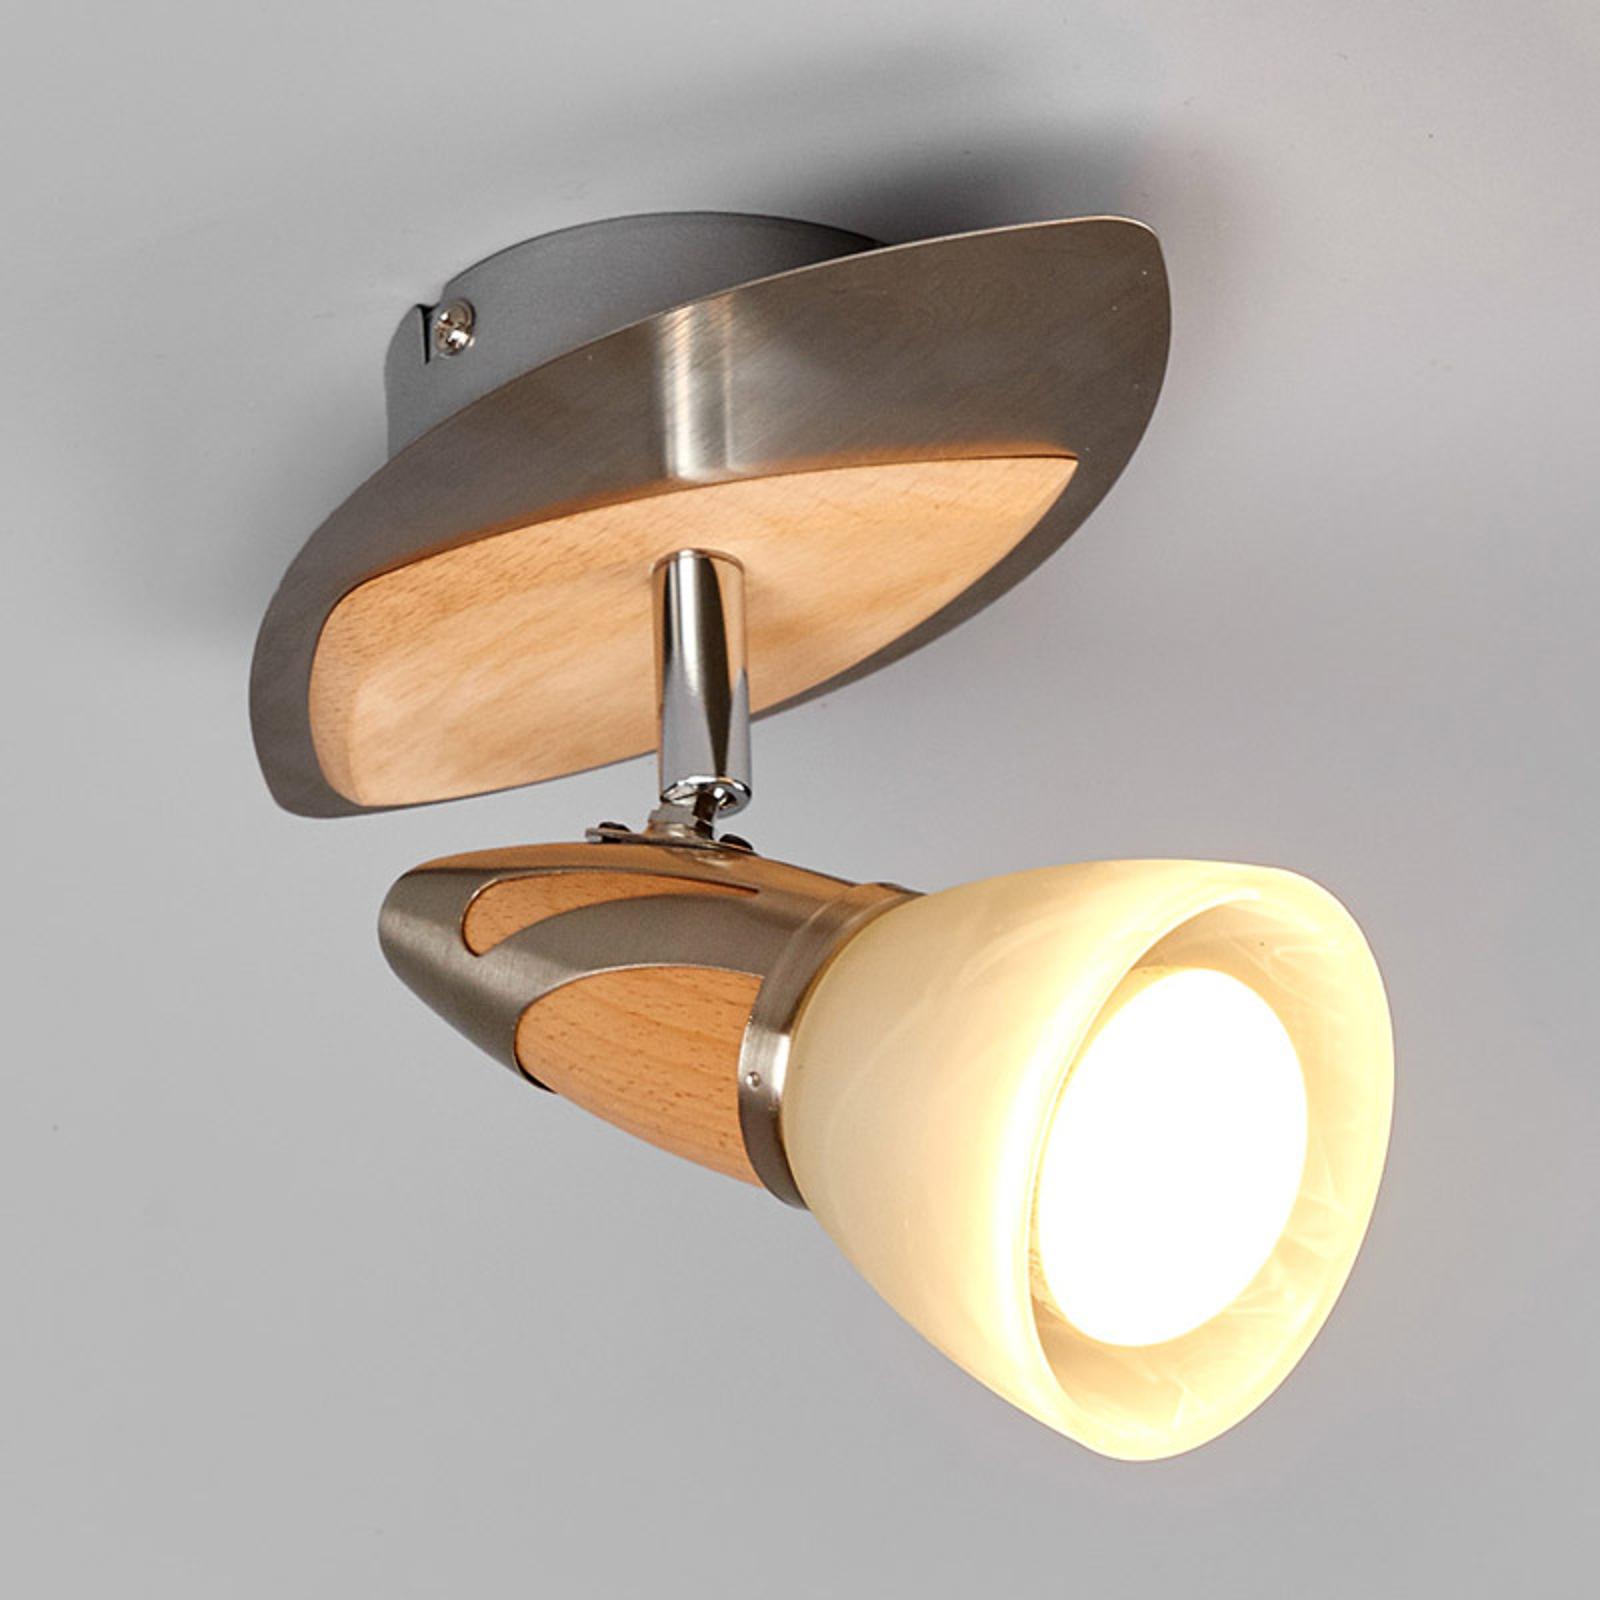 Spotti Marena, puuapplikoinnit, E14 R50 LED